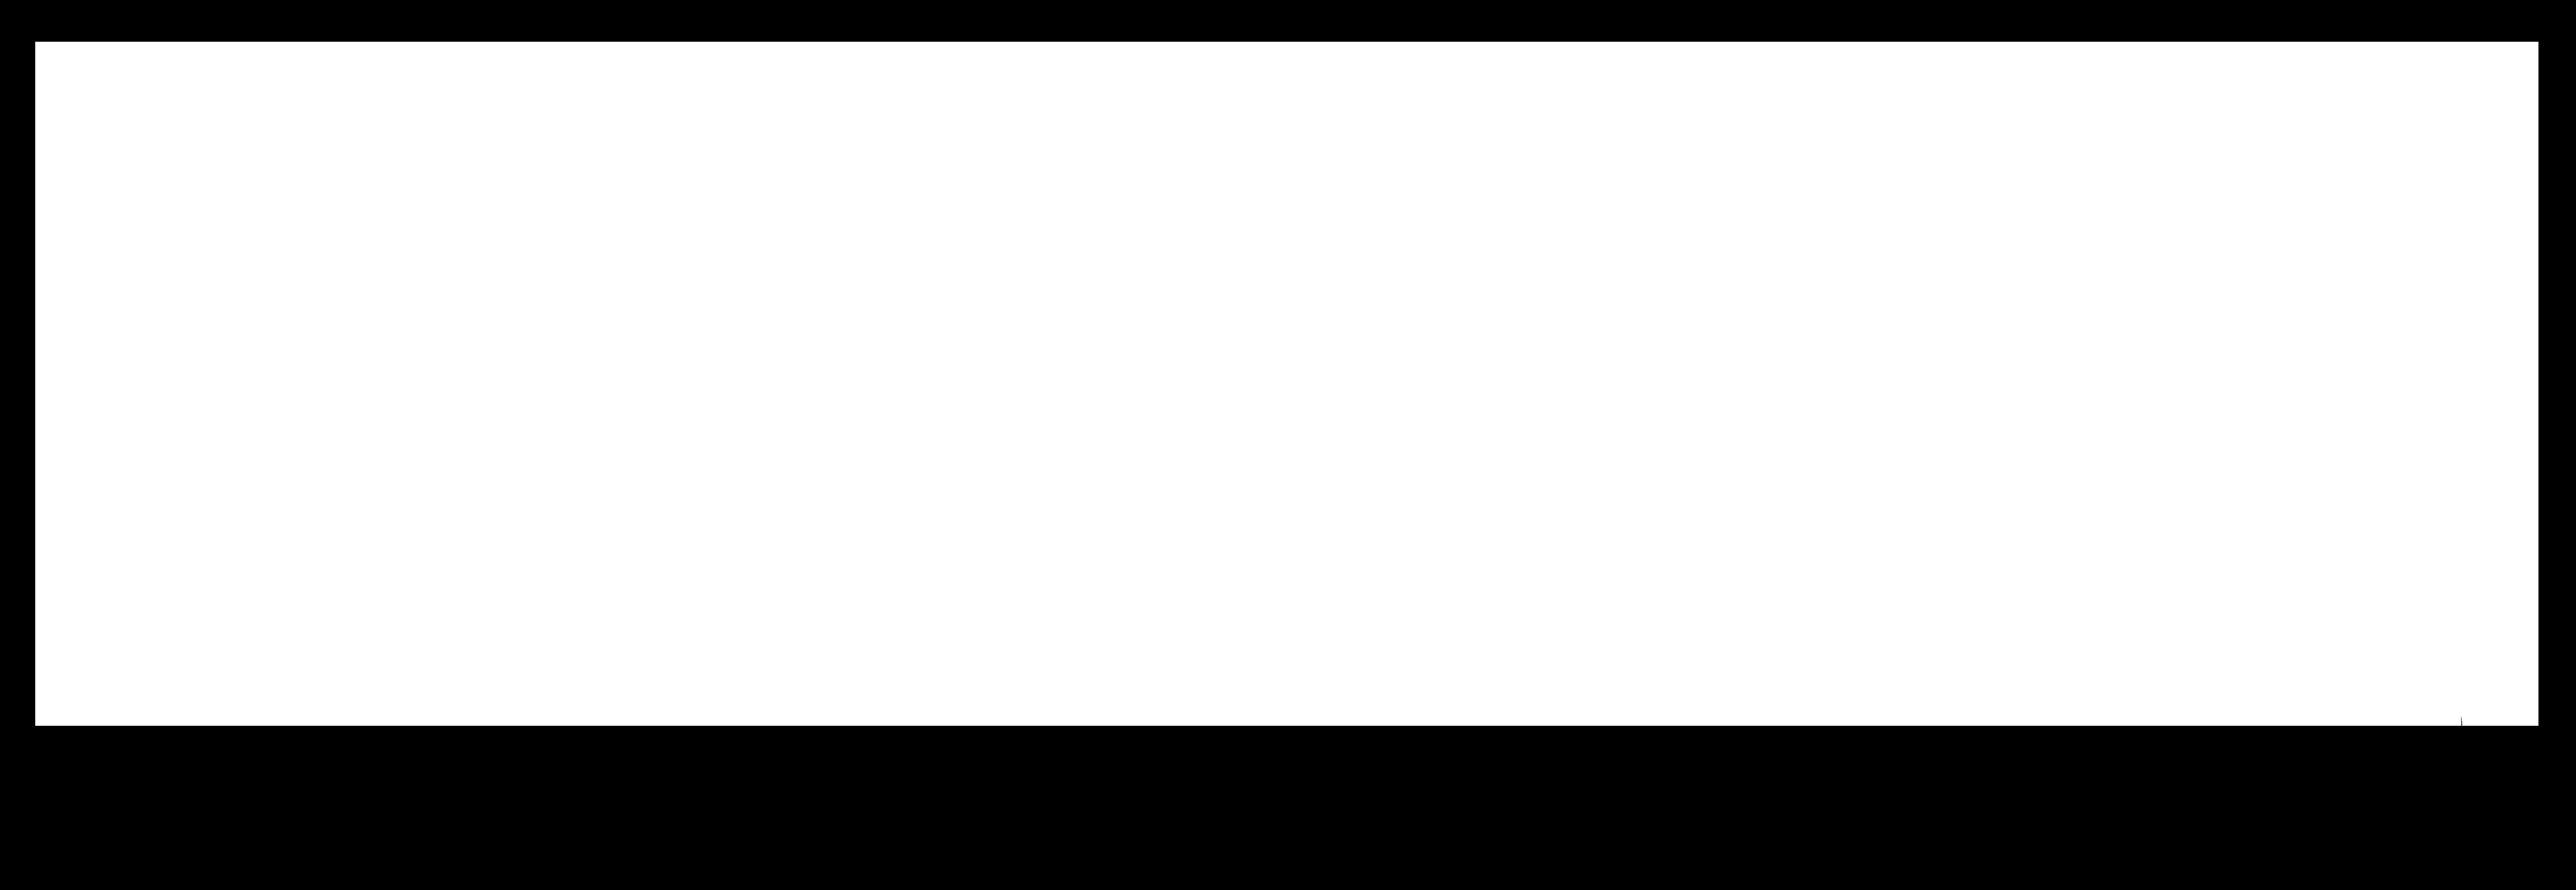 Rurex Turbo